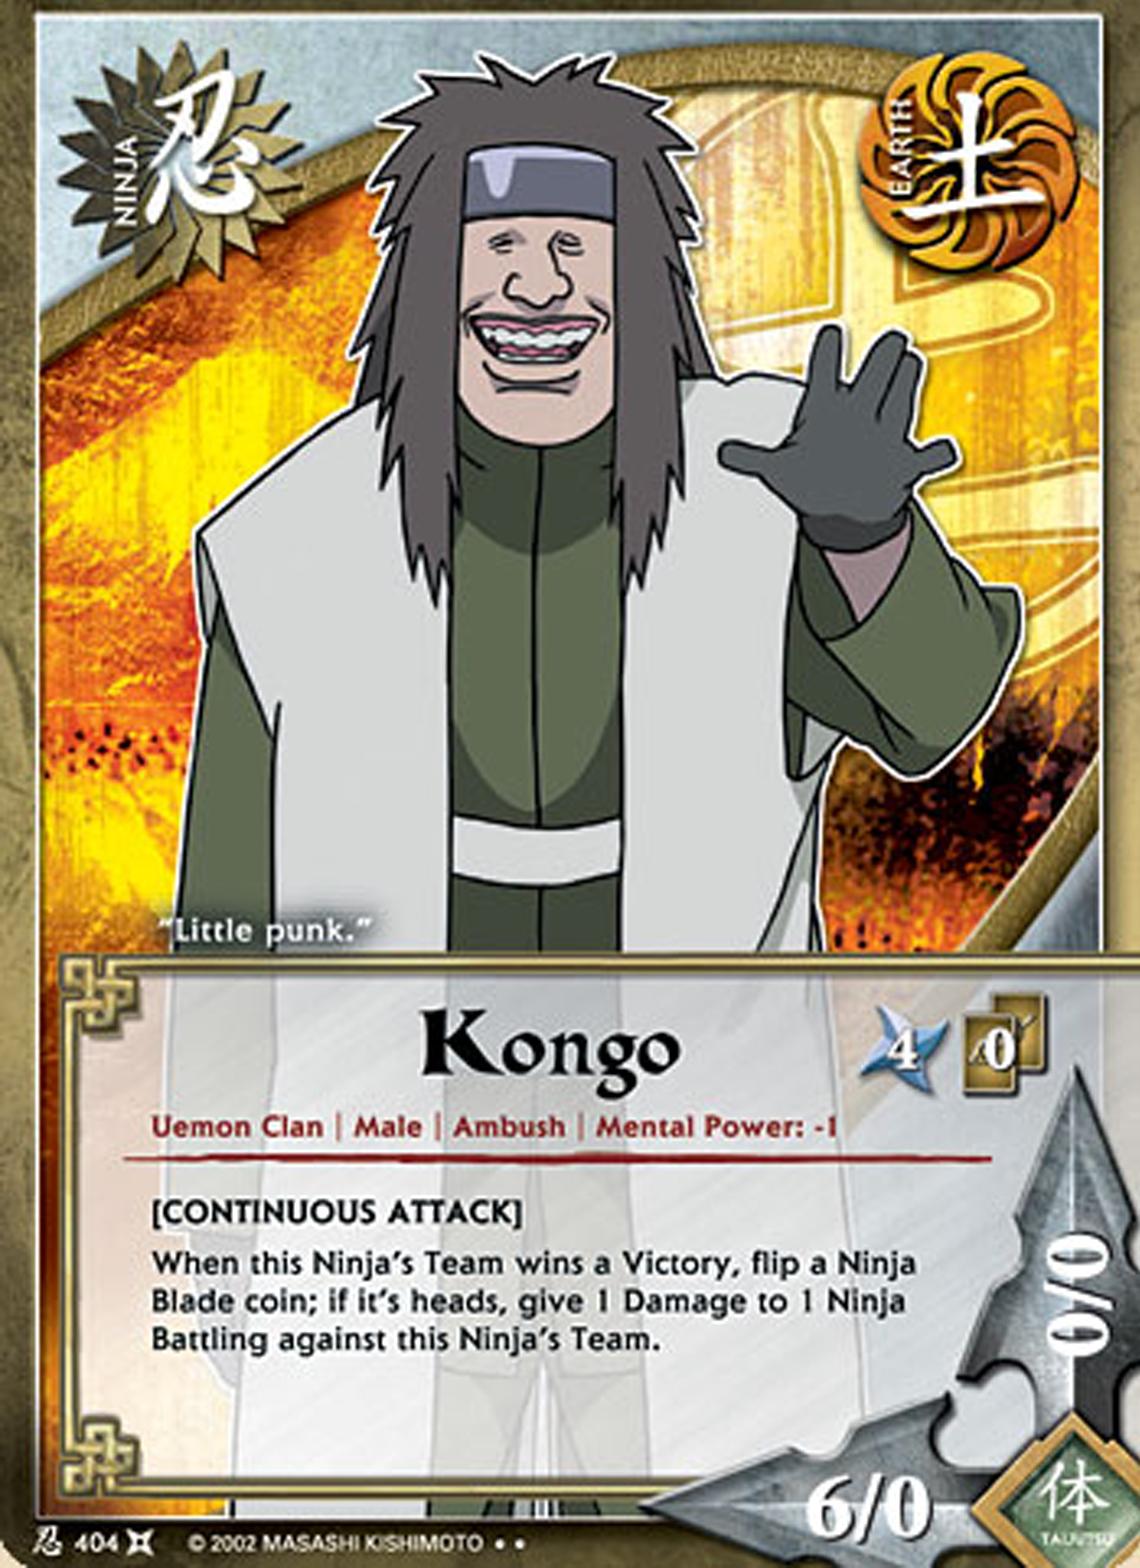 Pin by Enilton Souza on Naruto X Boruto | Anime, Boruto ...